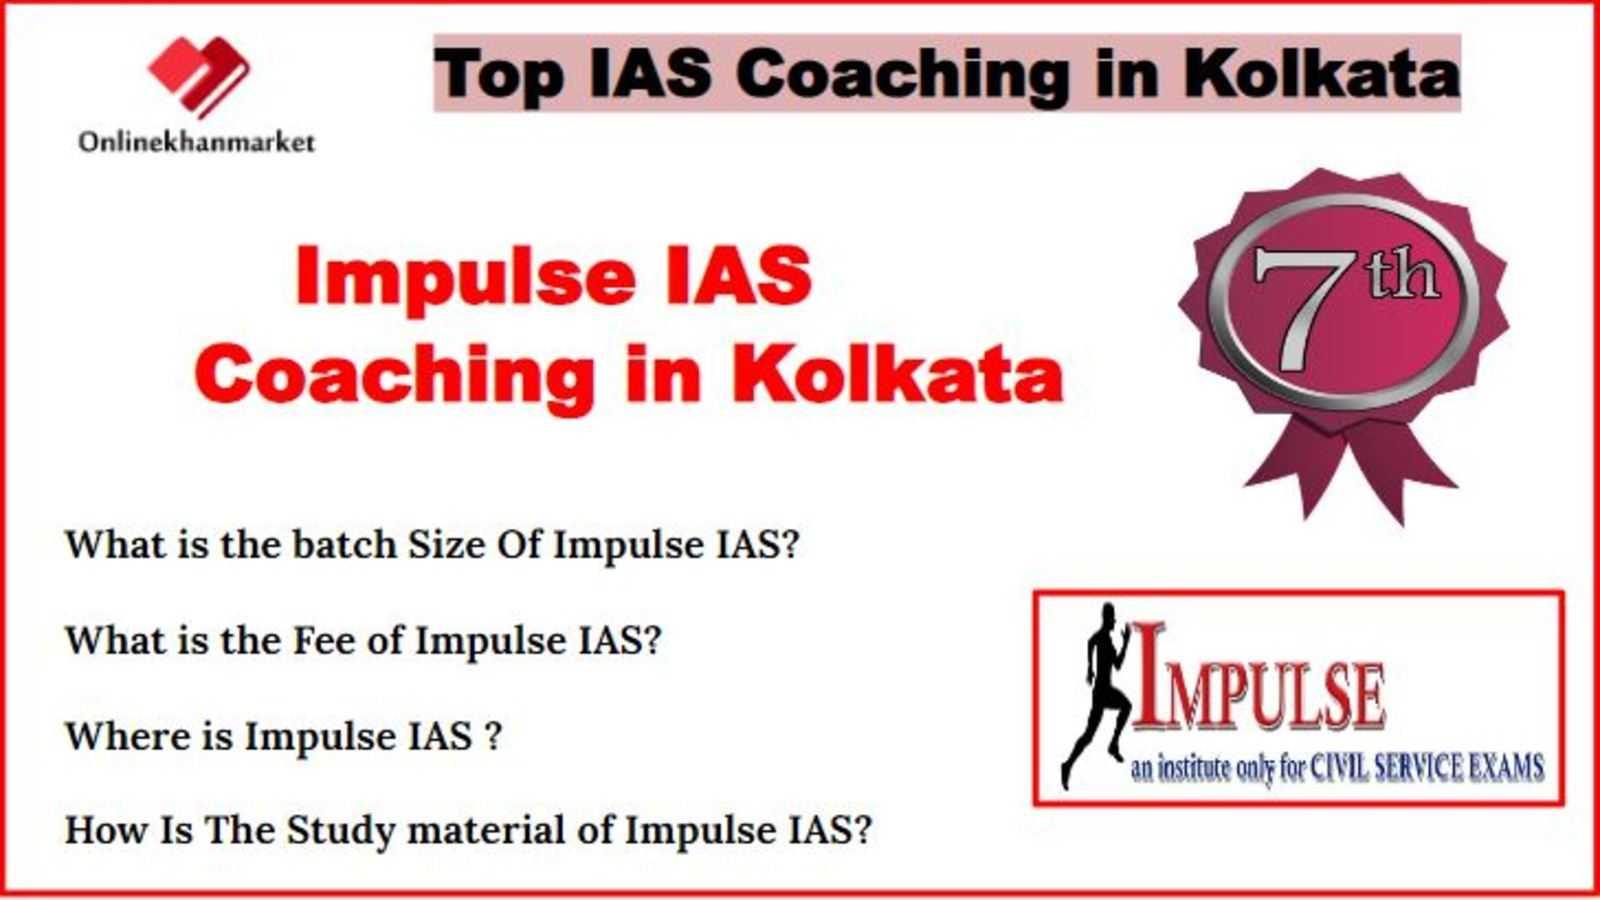 Best IAS Coaching in Kolkata